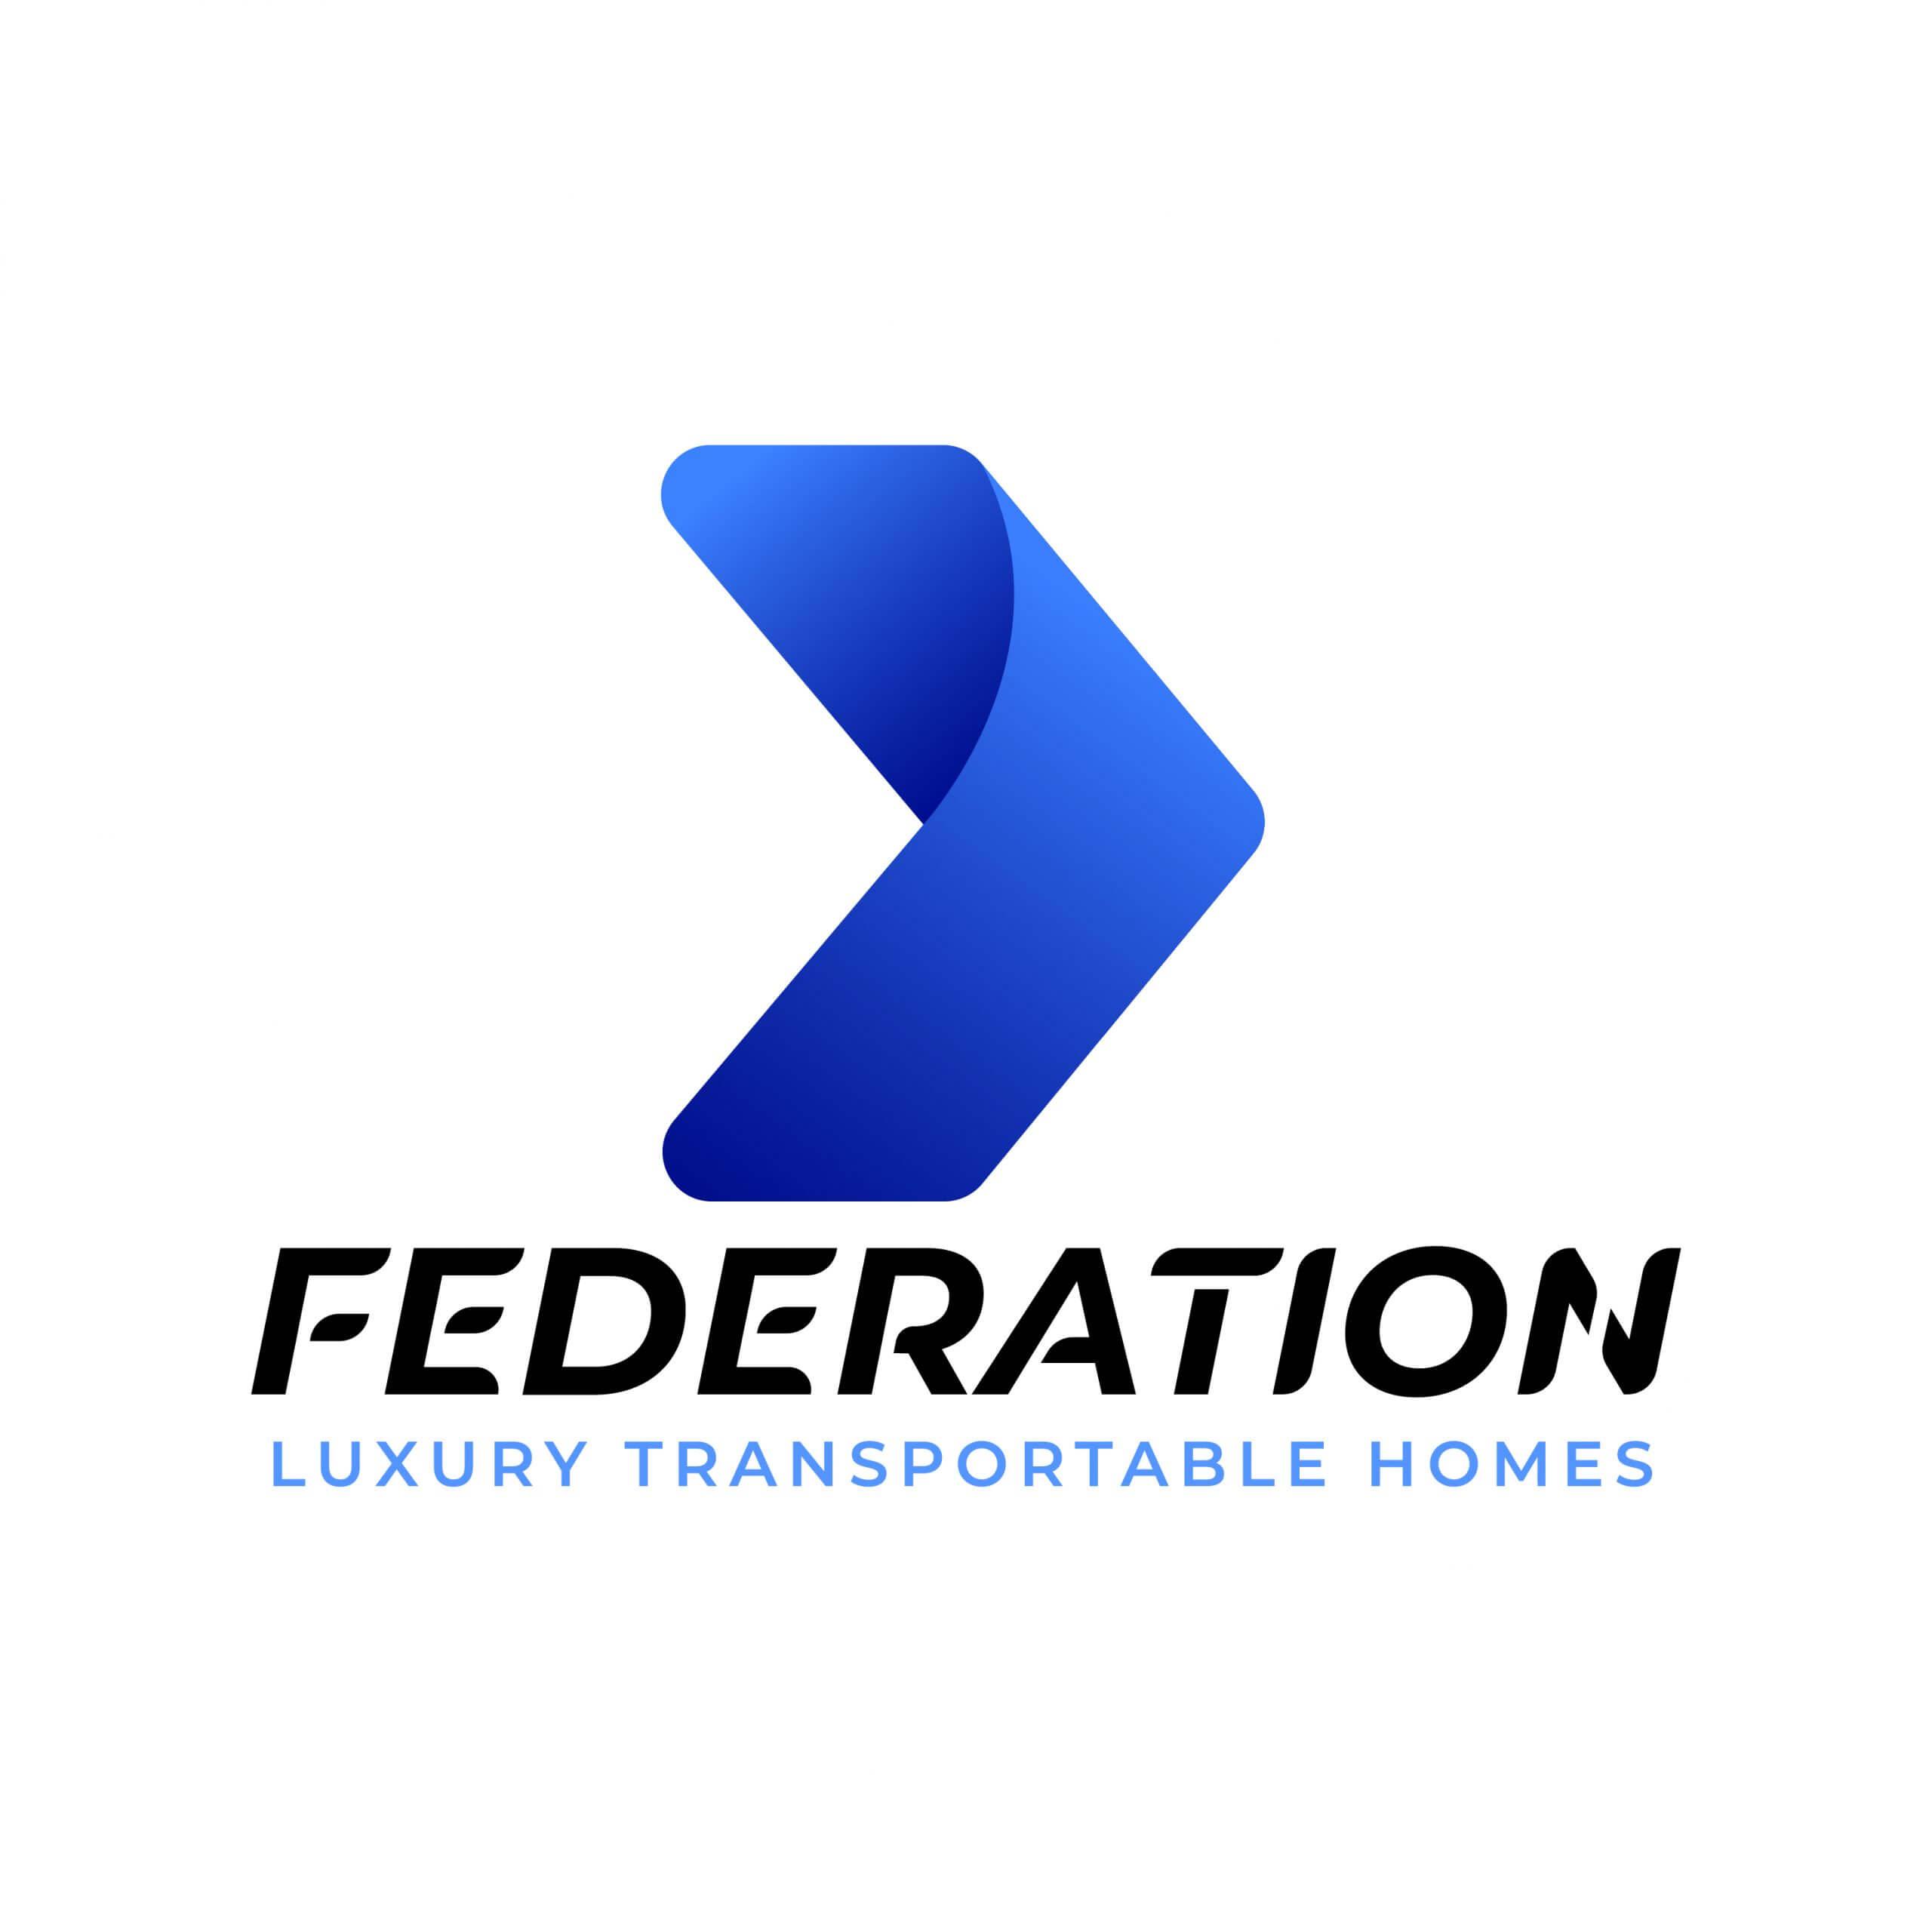 Federation Luxury Transportable Homes logo